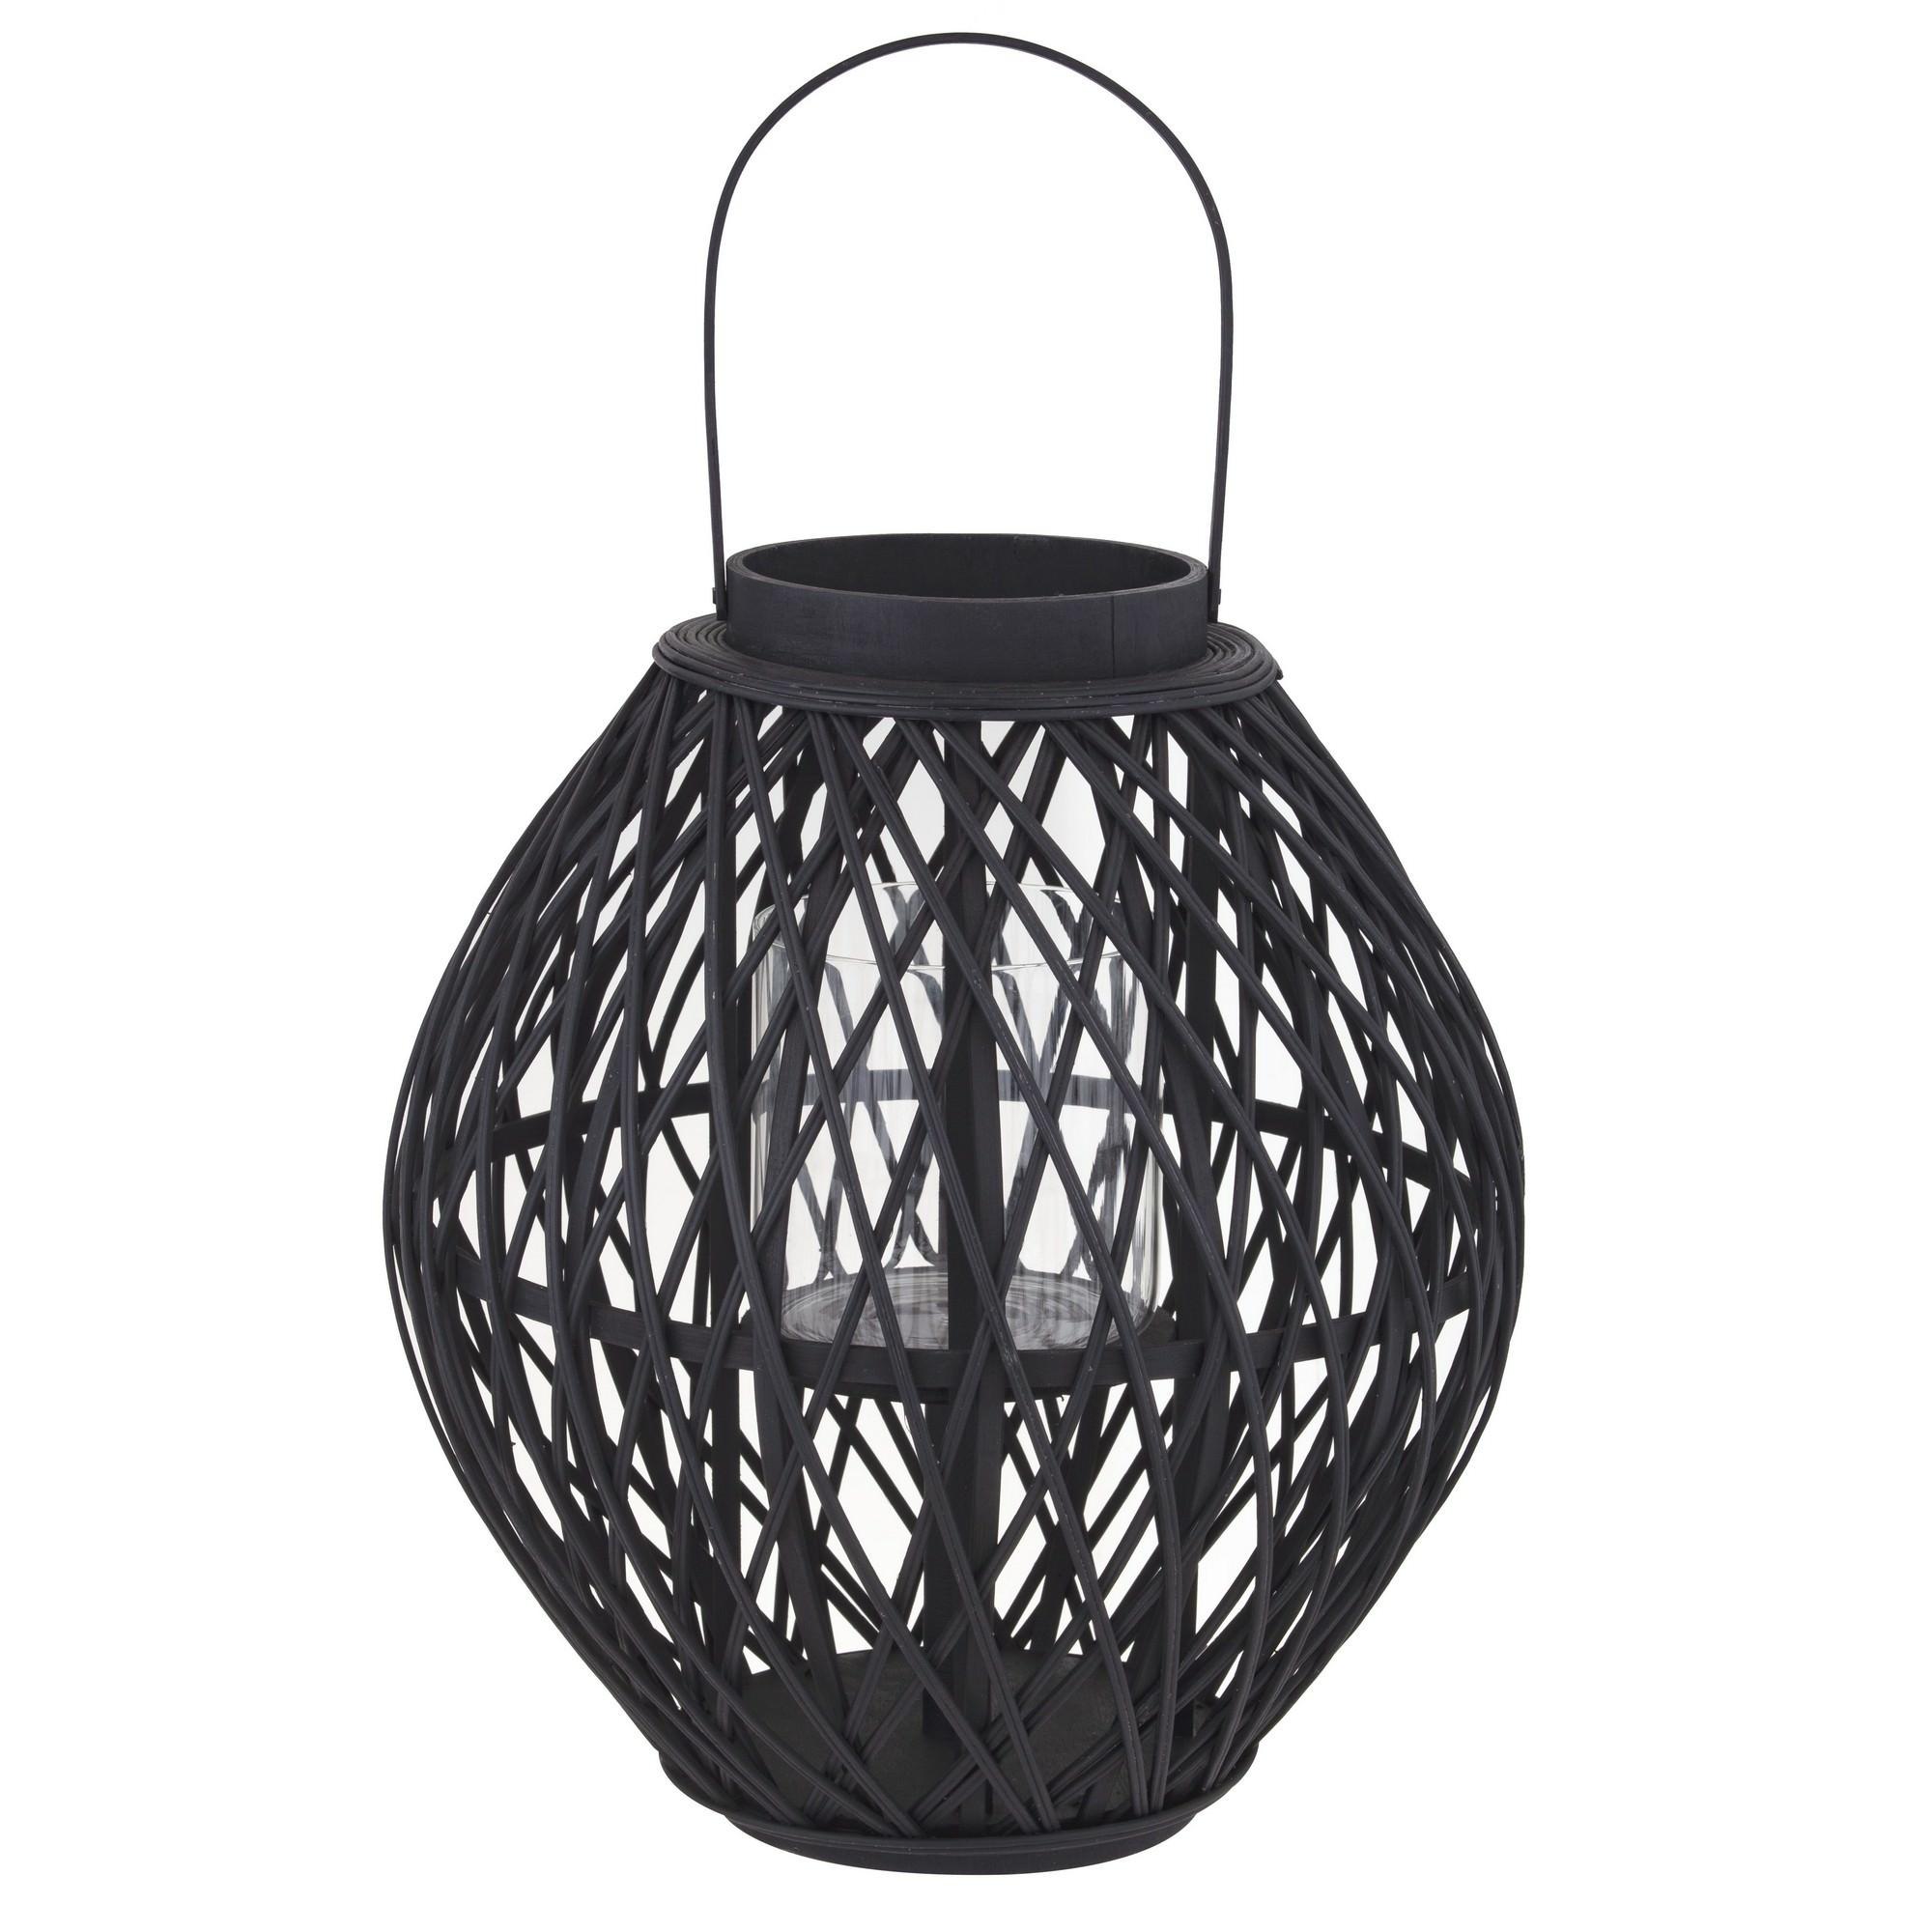 Starling Bamboo Rattan Lantern, Large